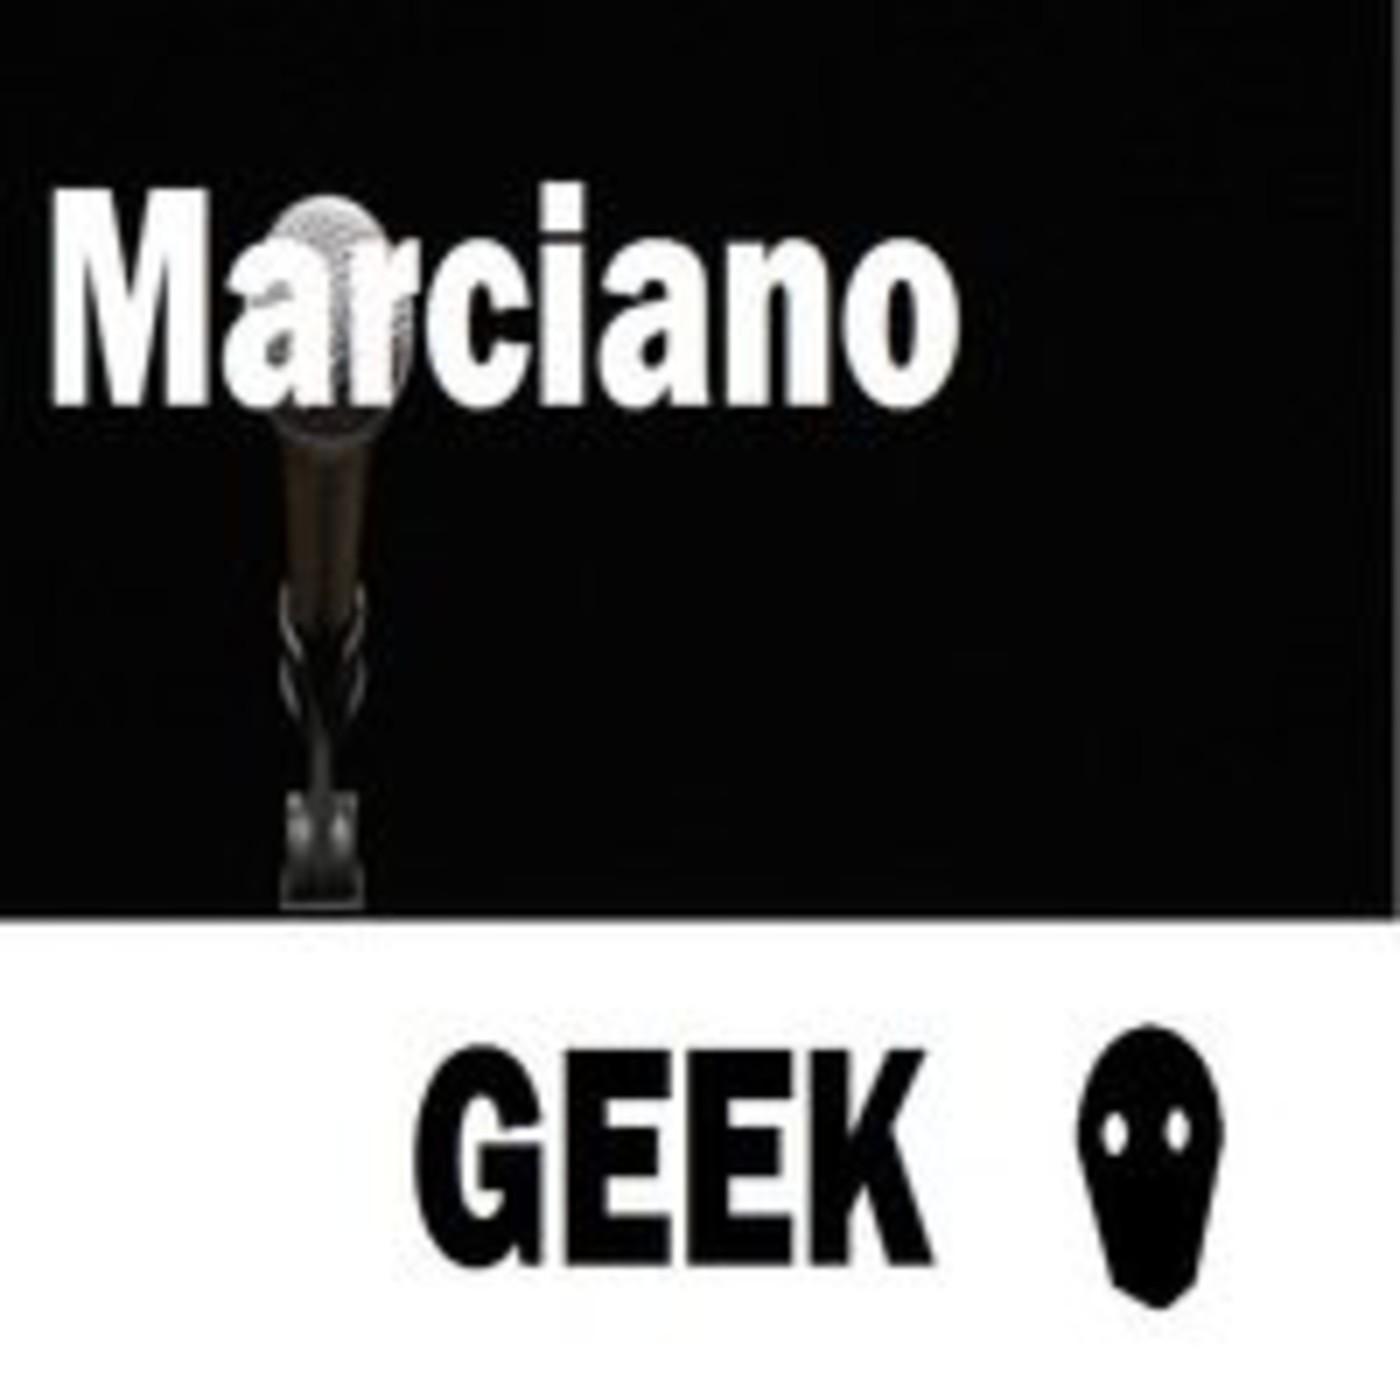 <![CDATA[Marcianos Geeks]]>